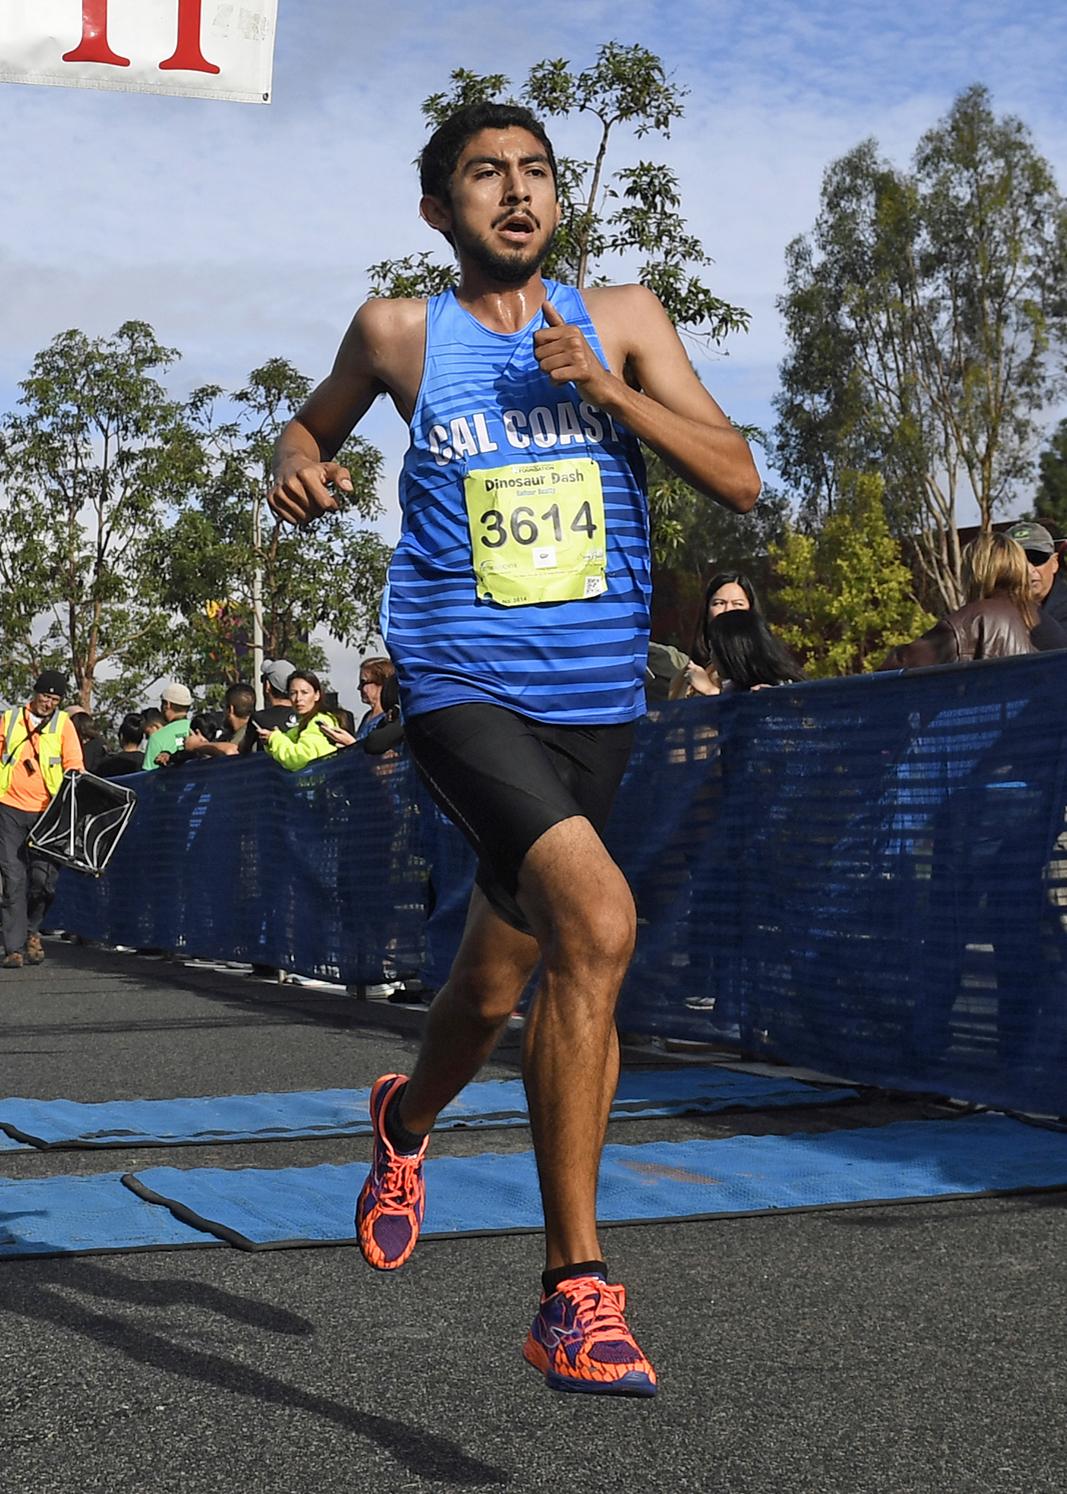 Jose Penaloza - Personal Record in the 3000 meters of 8:40Personal Record in the 5000 meters of 14:46Personal Record in the 8000 meters of 24:42Personal Record in the 10,000 meters of 30:38Personal Record in the Half Marathon of 1:11:58